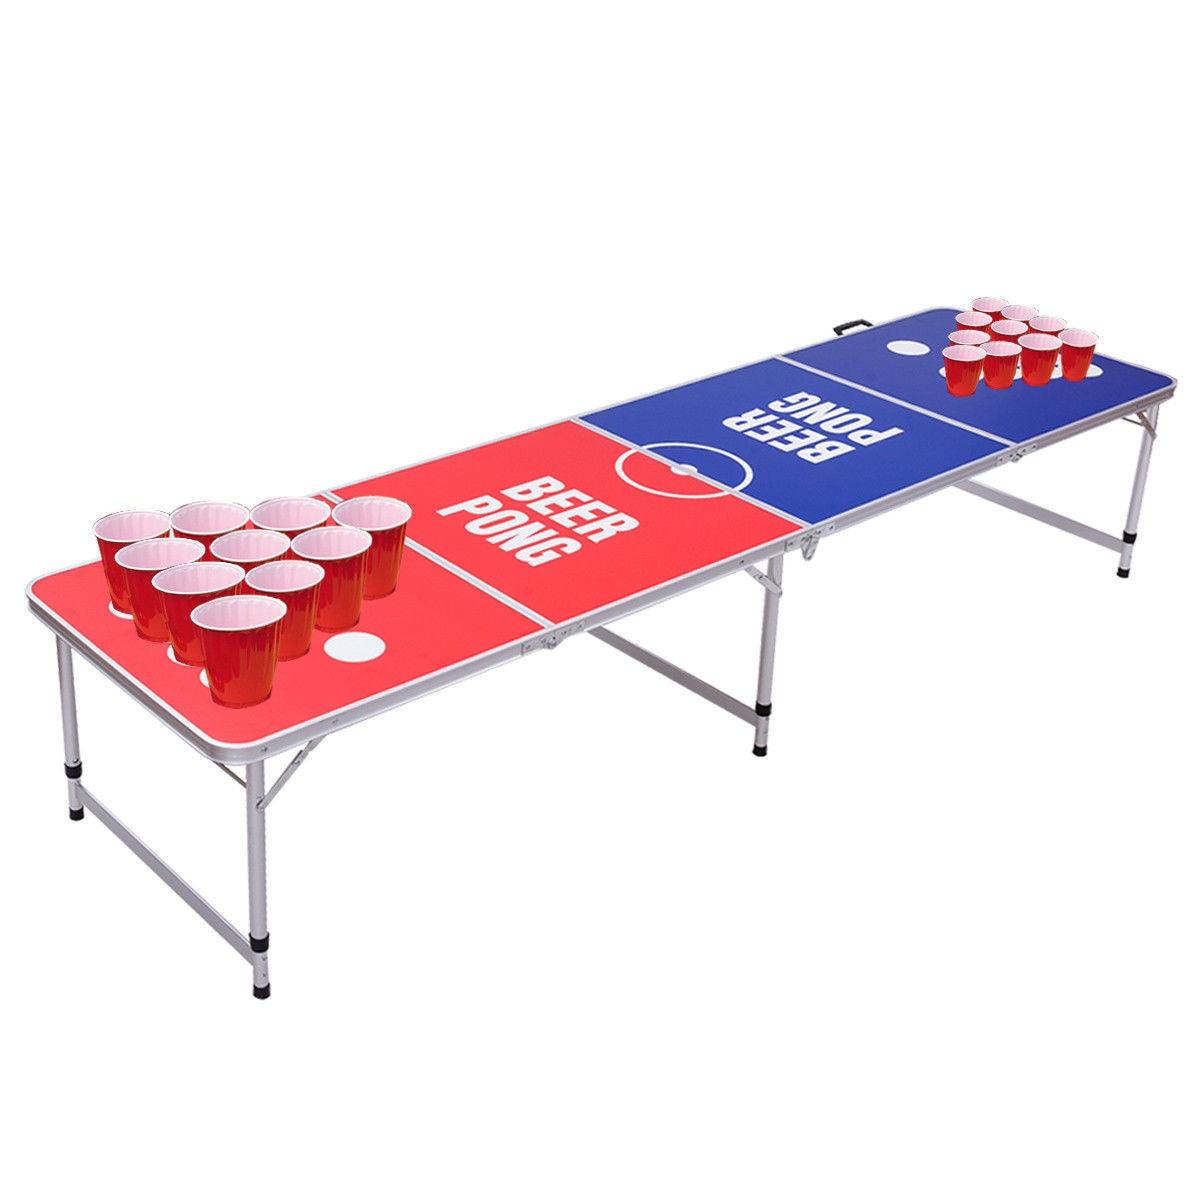 giantex 8ft tragbare falten bier pong tisch moderne partei gaming schreibtisch faltbare picknick im freien camping tische op3334 in giantex 8ft tragbare